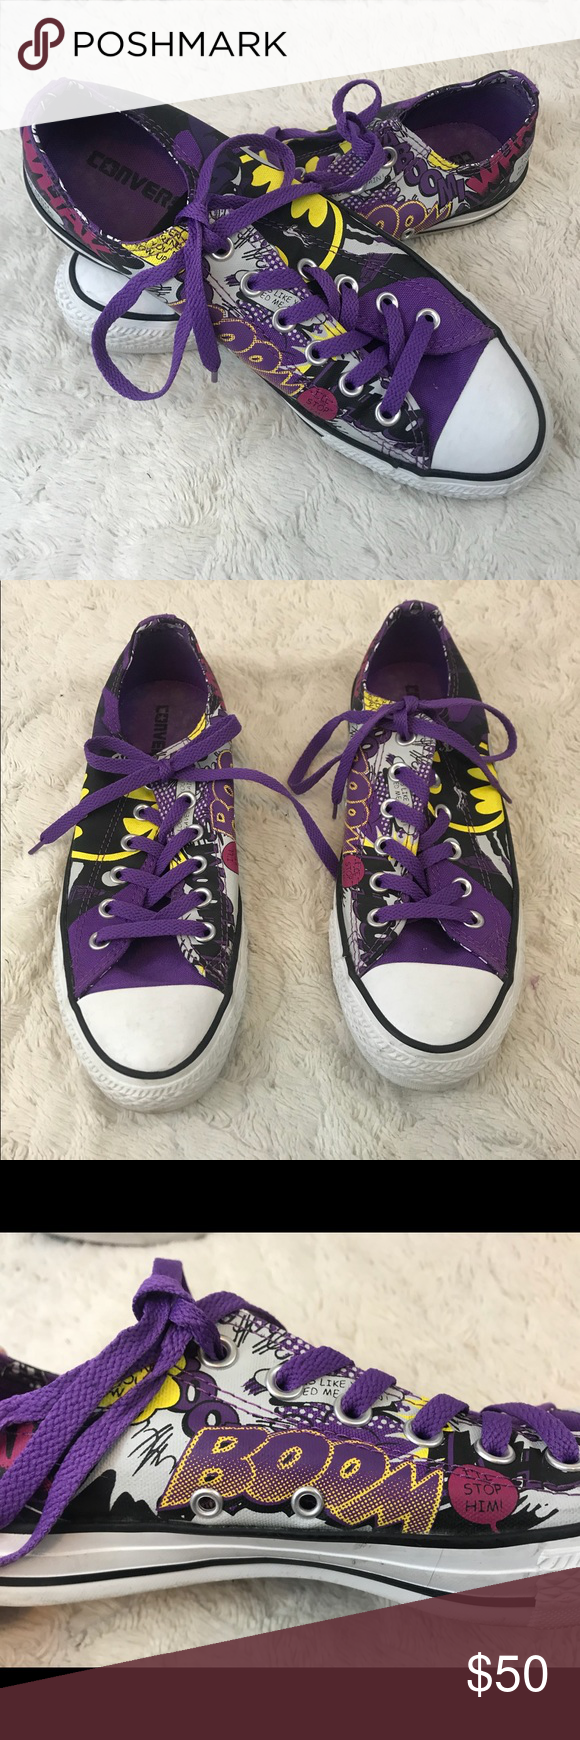 806228aa6510 Rare Batman Catwoman Purple Converse